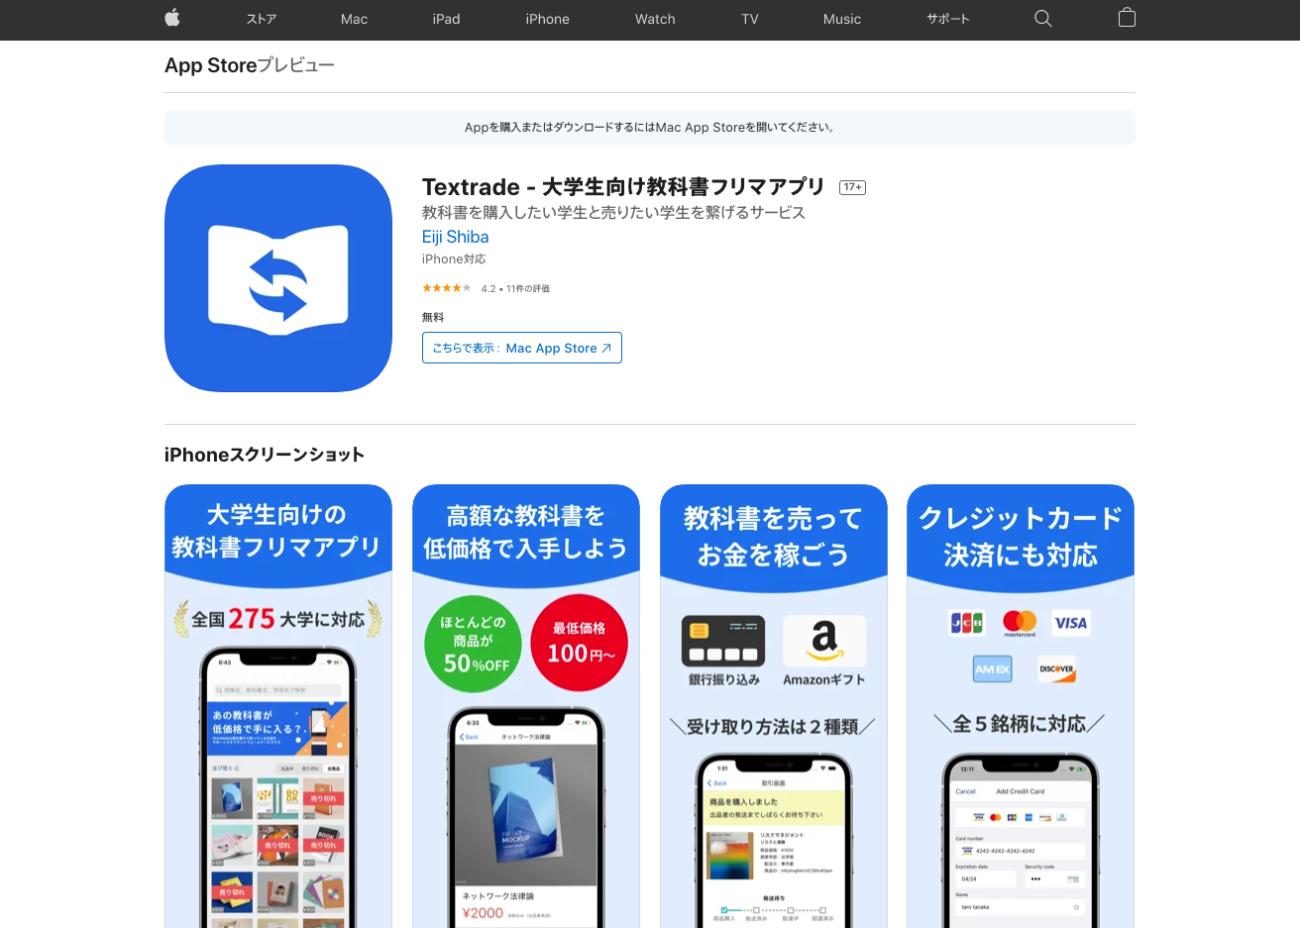 Textrade - 大学生向け教科書フリマアプリ